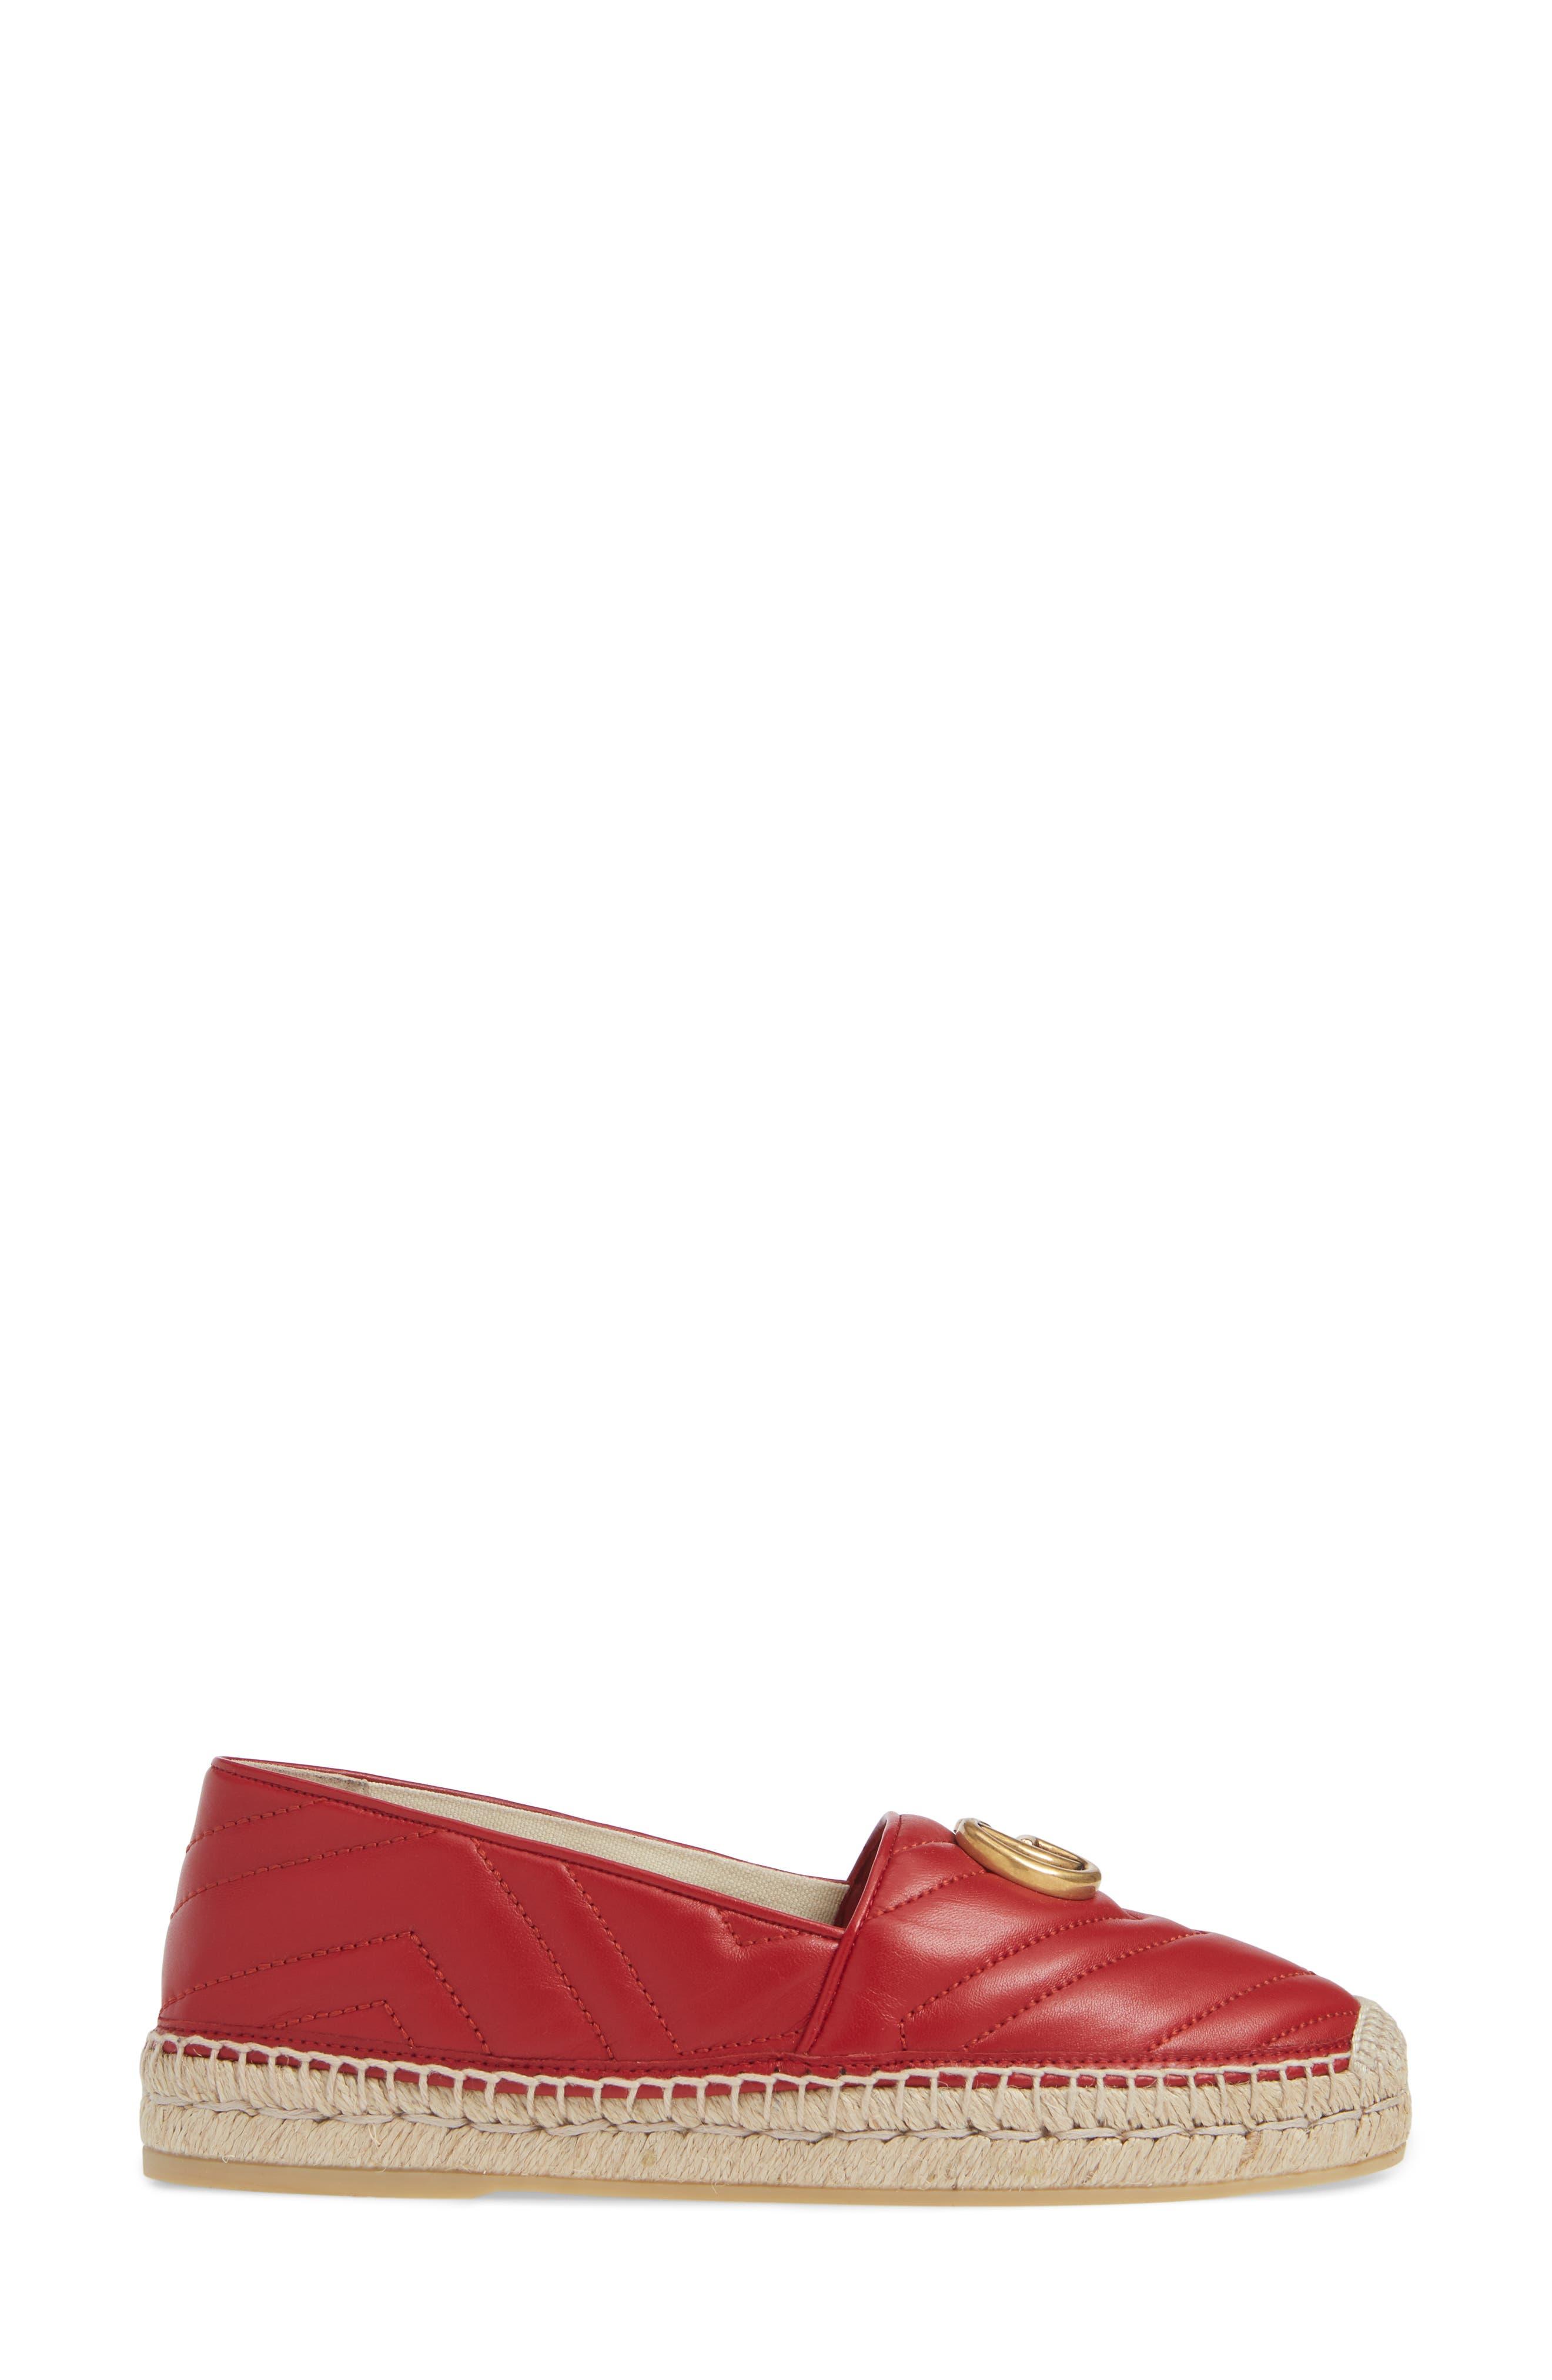 GUCCI, Pilar Chevron Flat Espadrille, Alternate thumbnail 3, color, HIBISCUS RED LEATHER